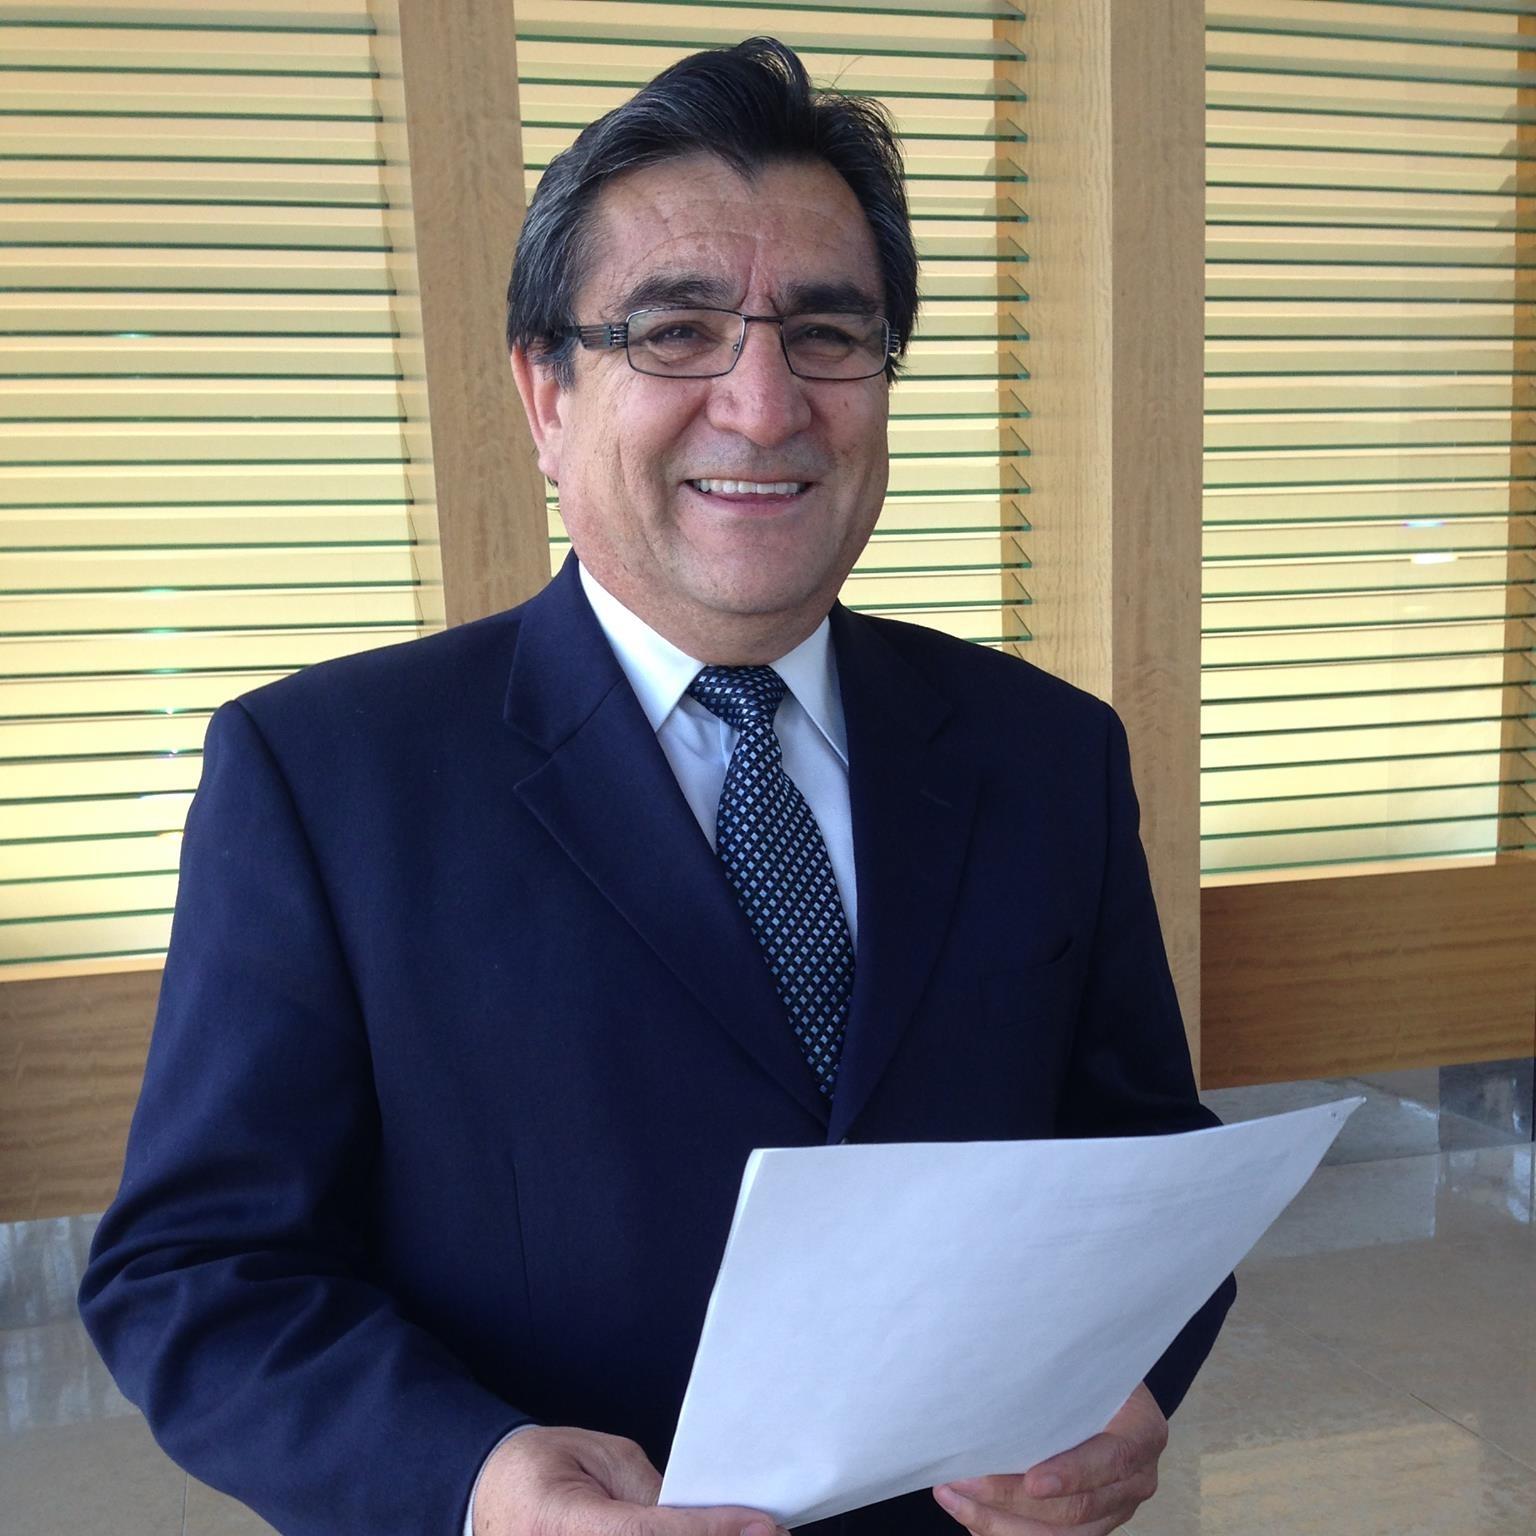 Ben_Monterroso_executive_director_of_Mi_Familia_Vota.jpg